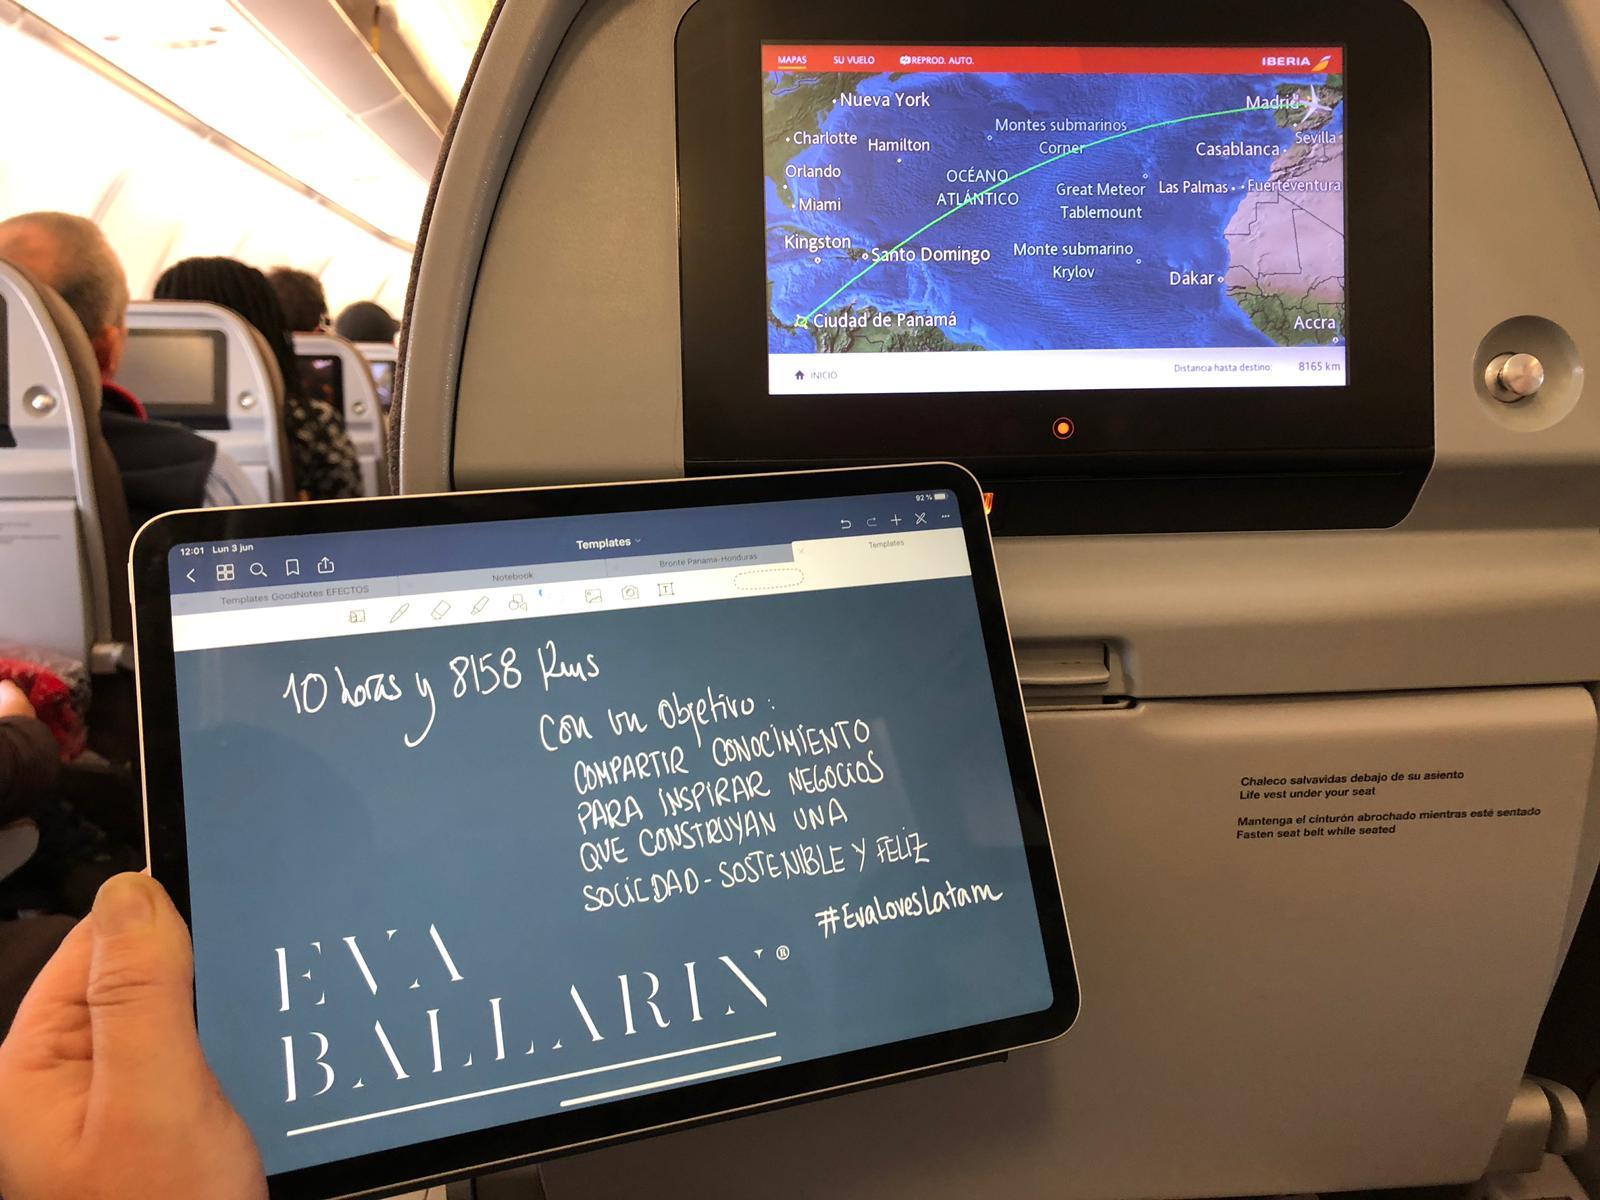 Agenda Ballarin: #EvaLovesLatam